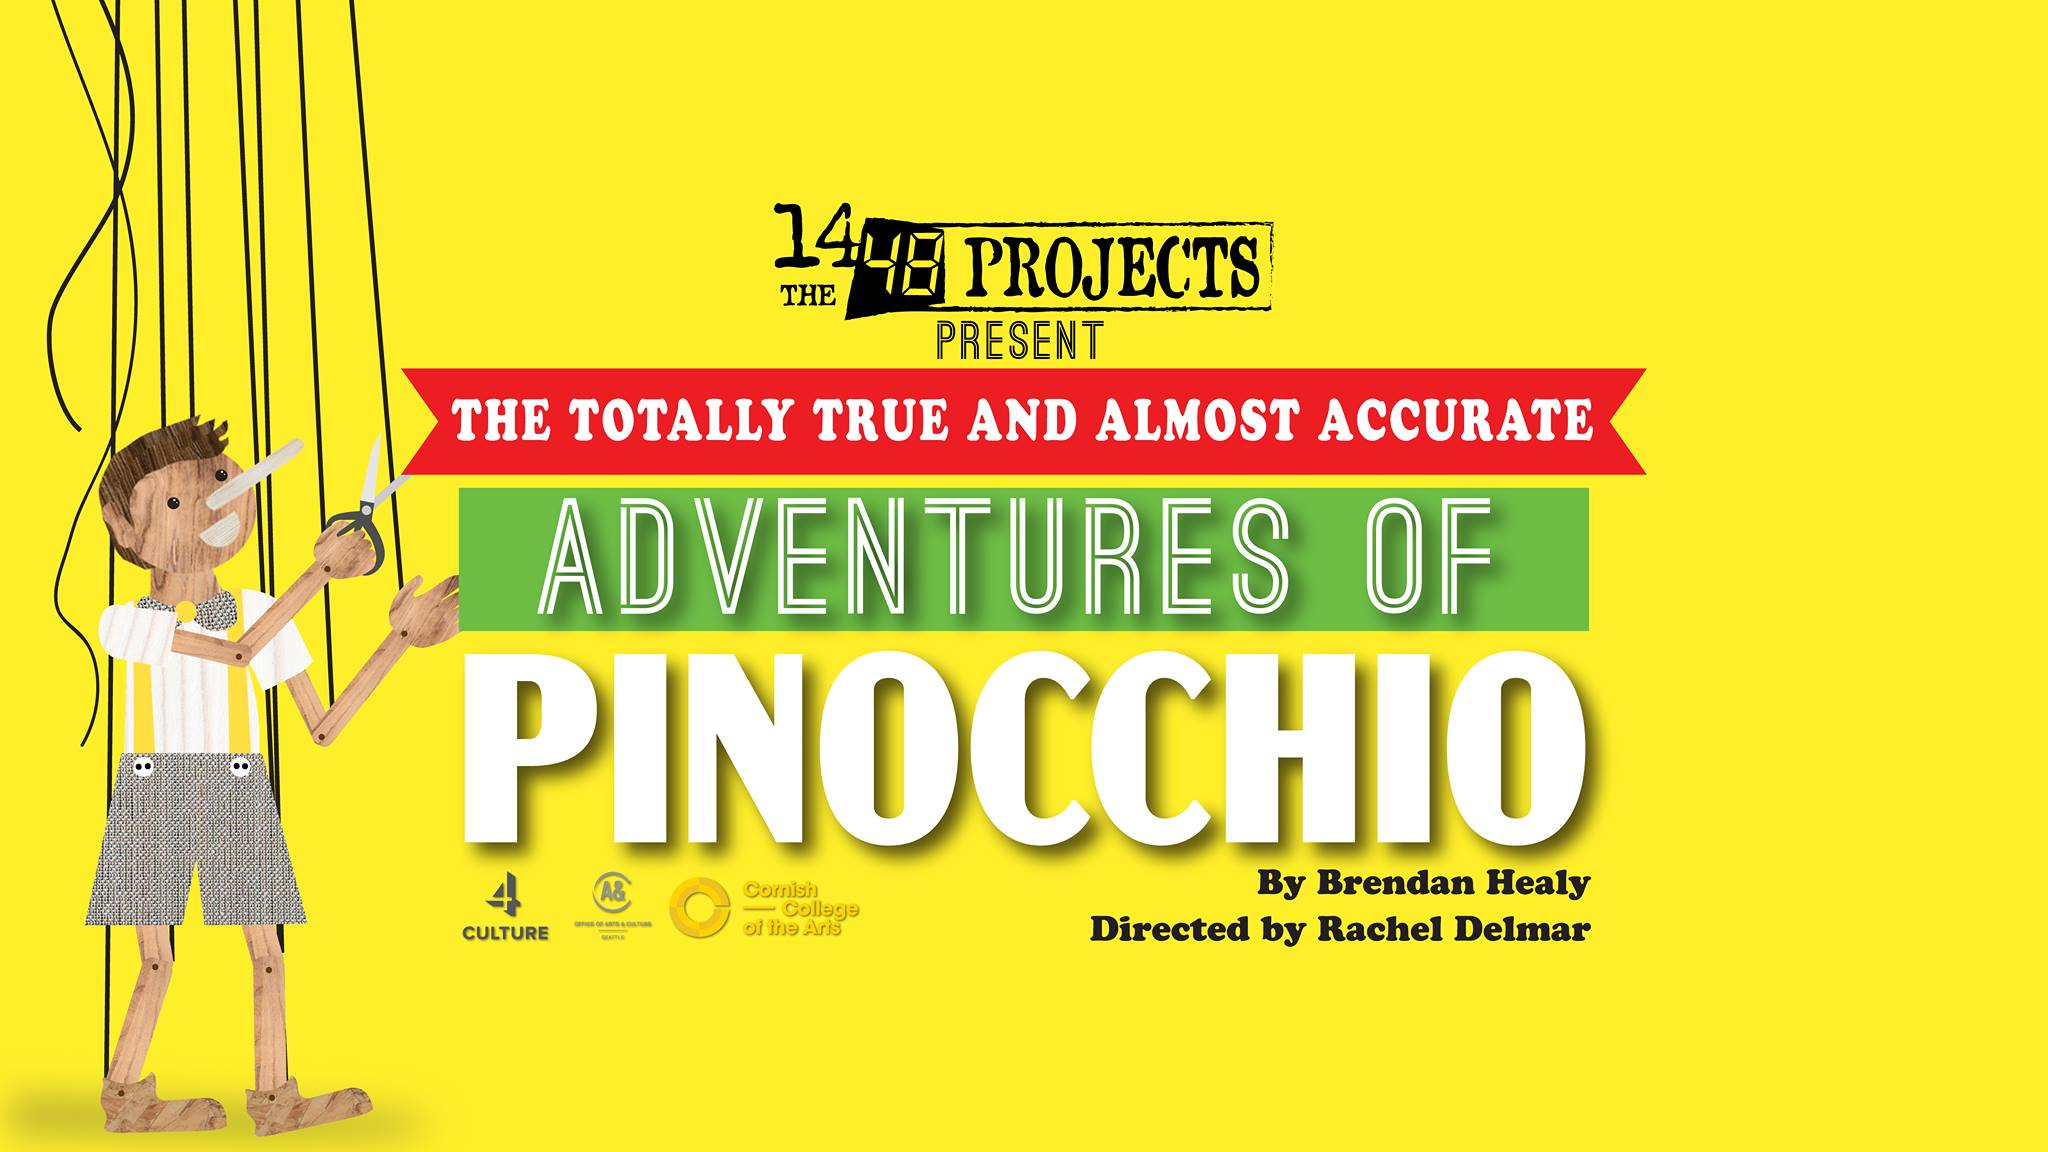 pinocchio banner.jpg